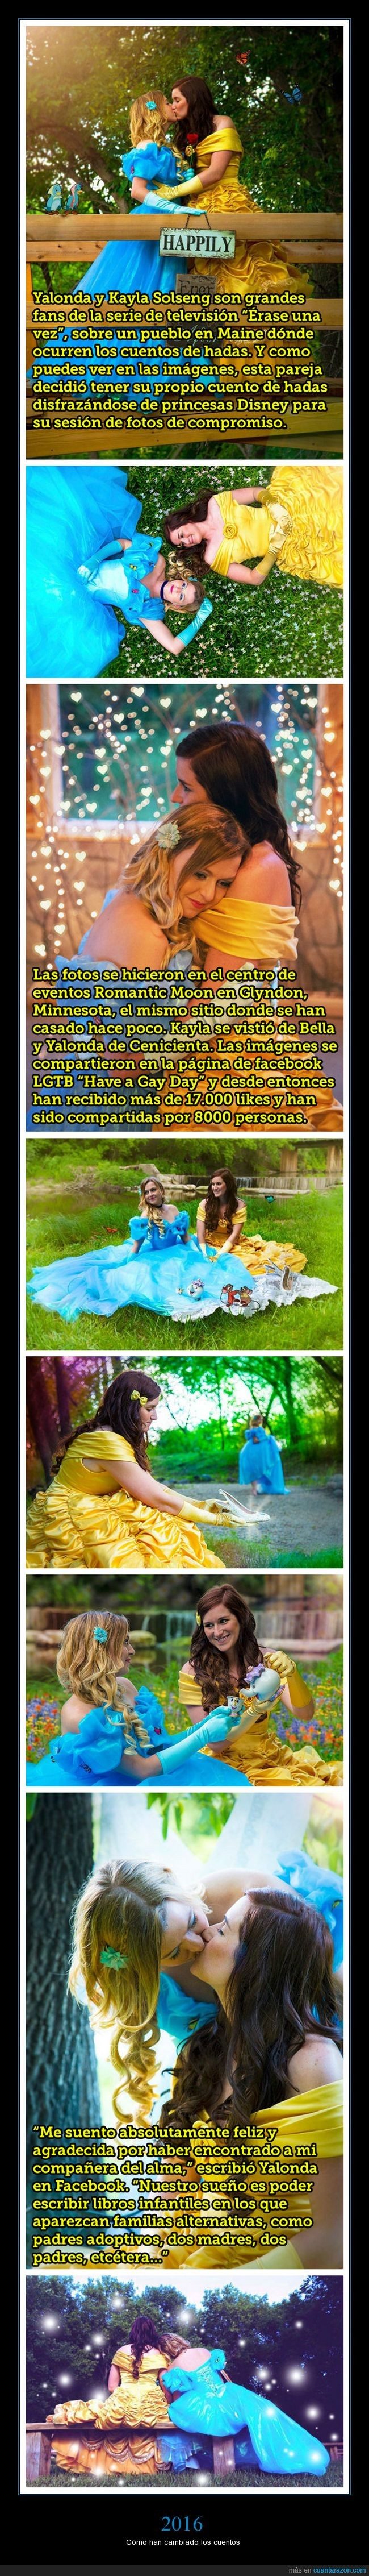 boda,disney,hadas,lesbianas,princesas